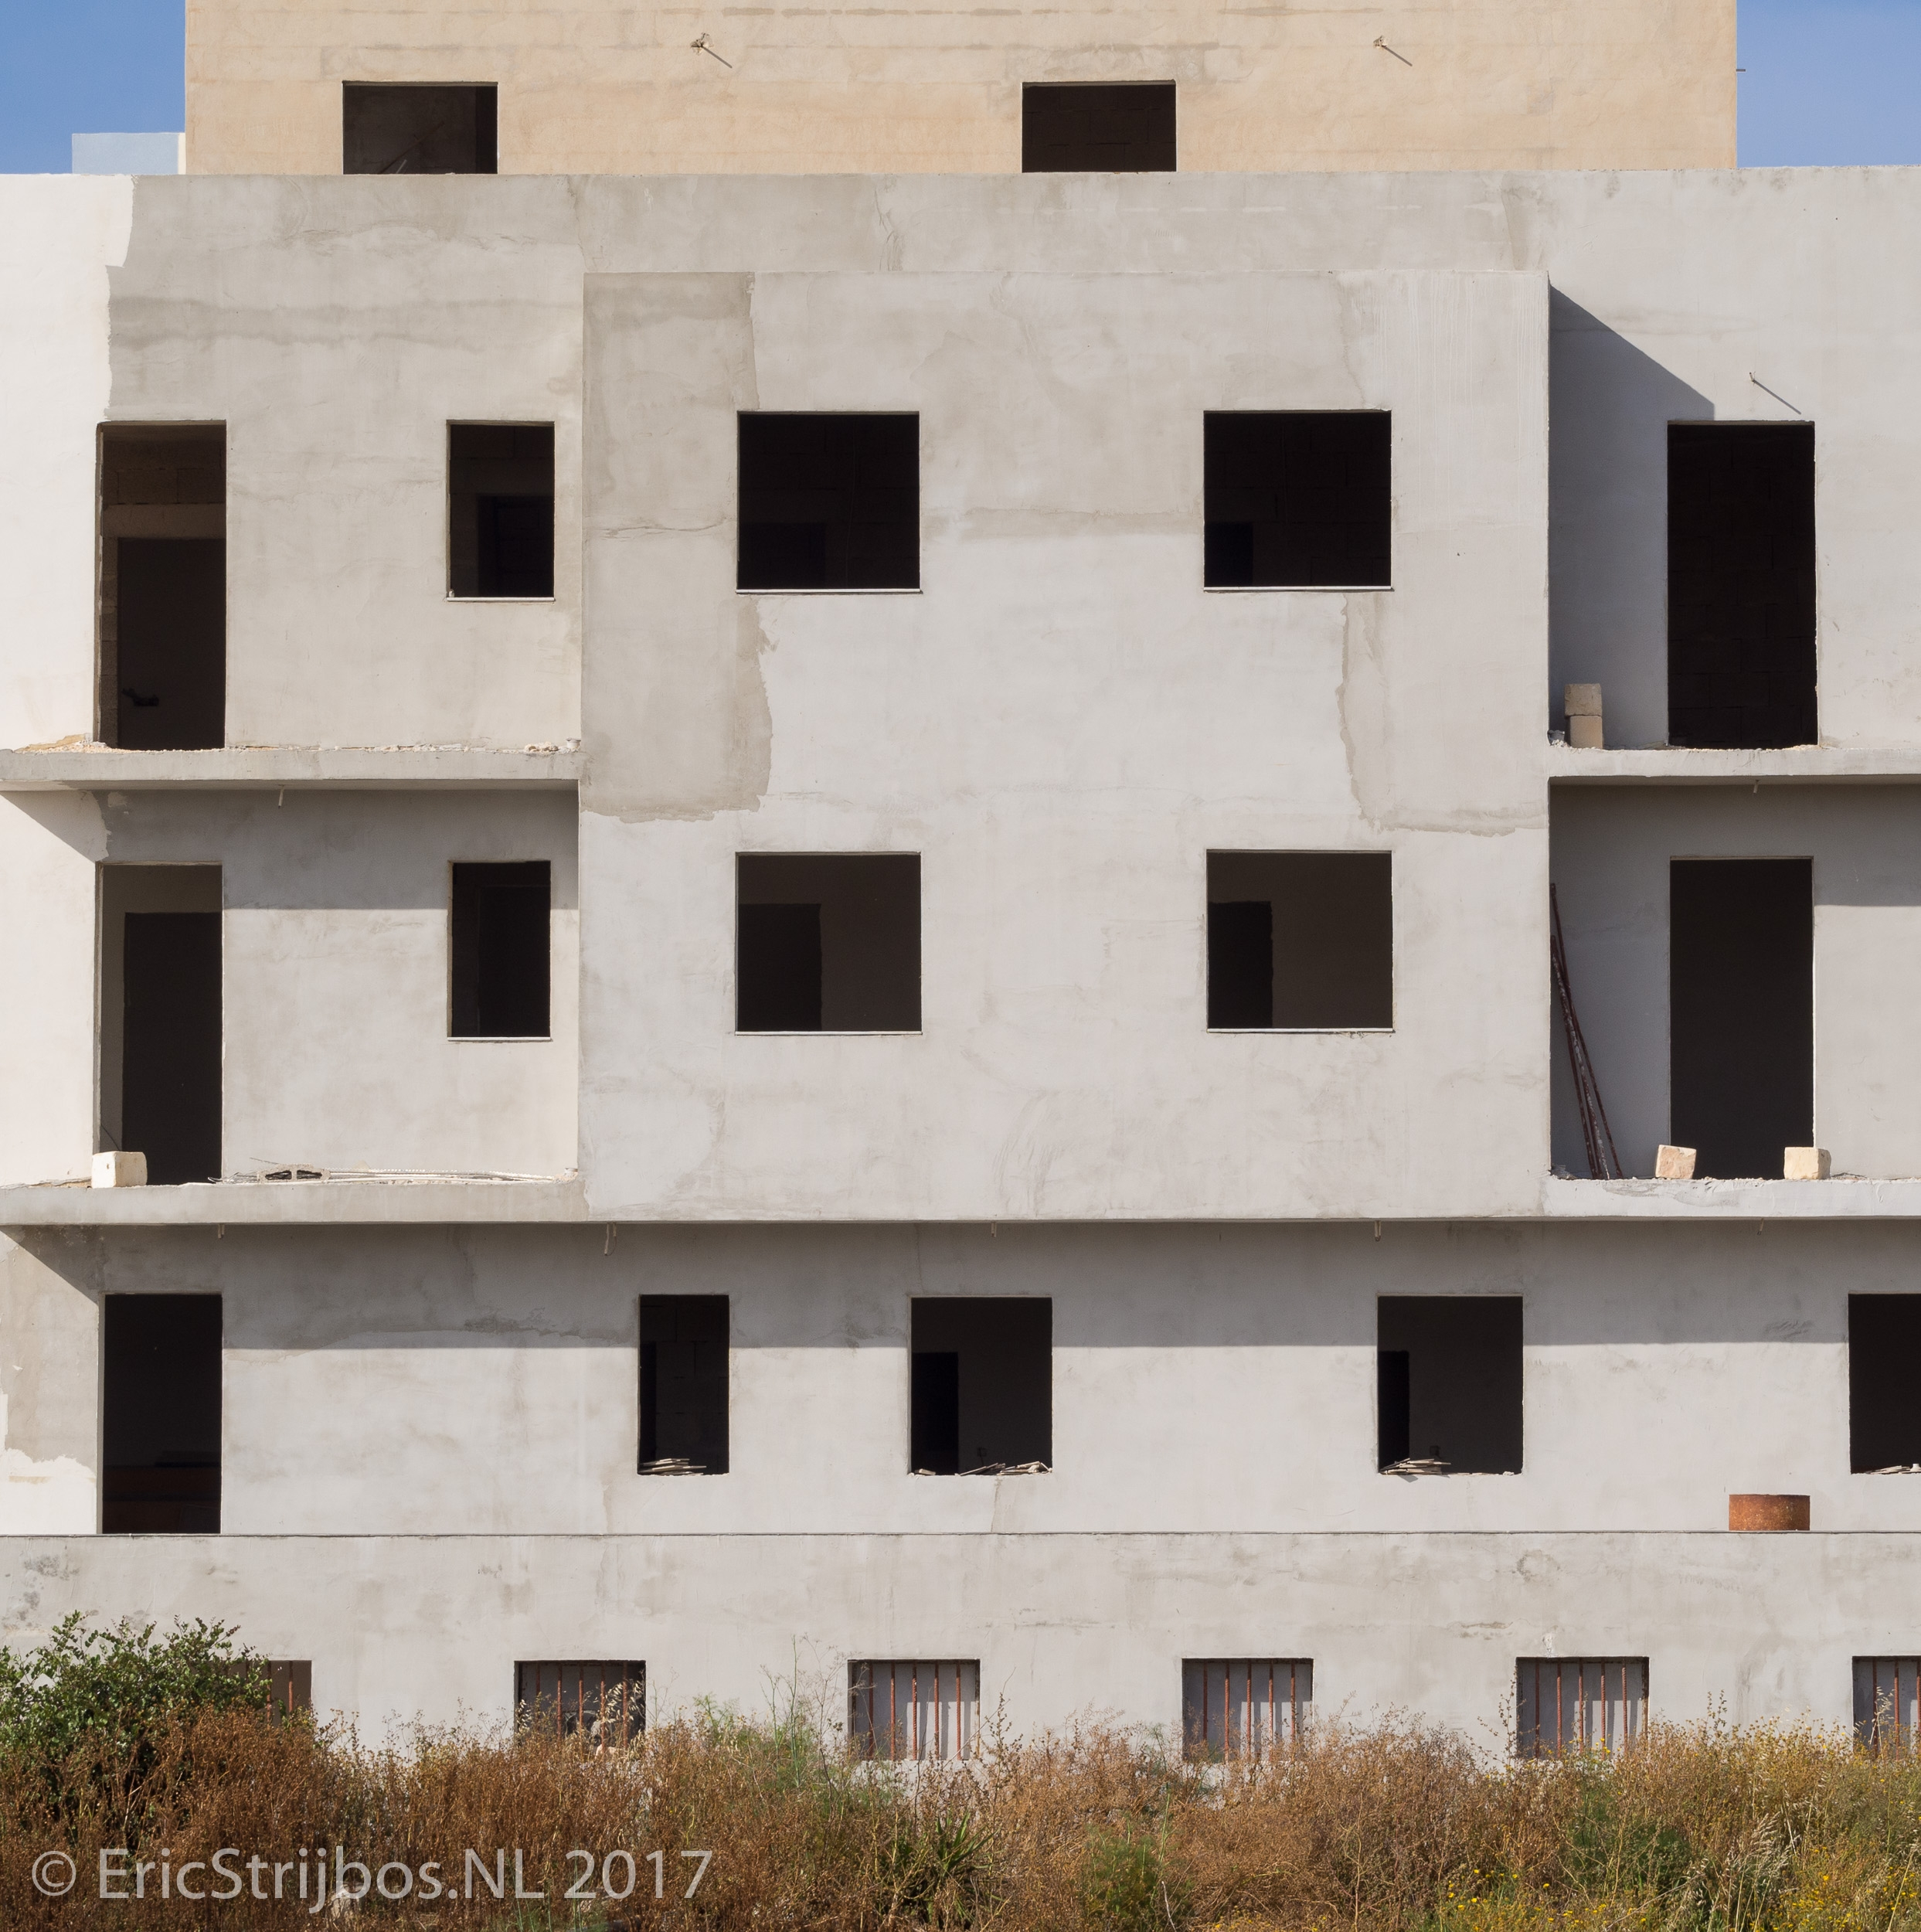 Salina Bay, Malta - architecture - ericstrijbos | ello